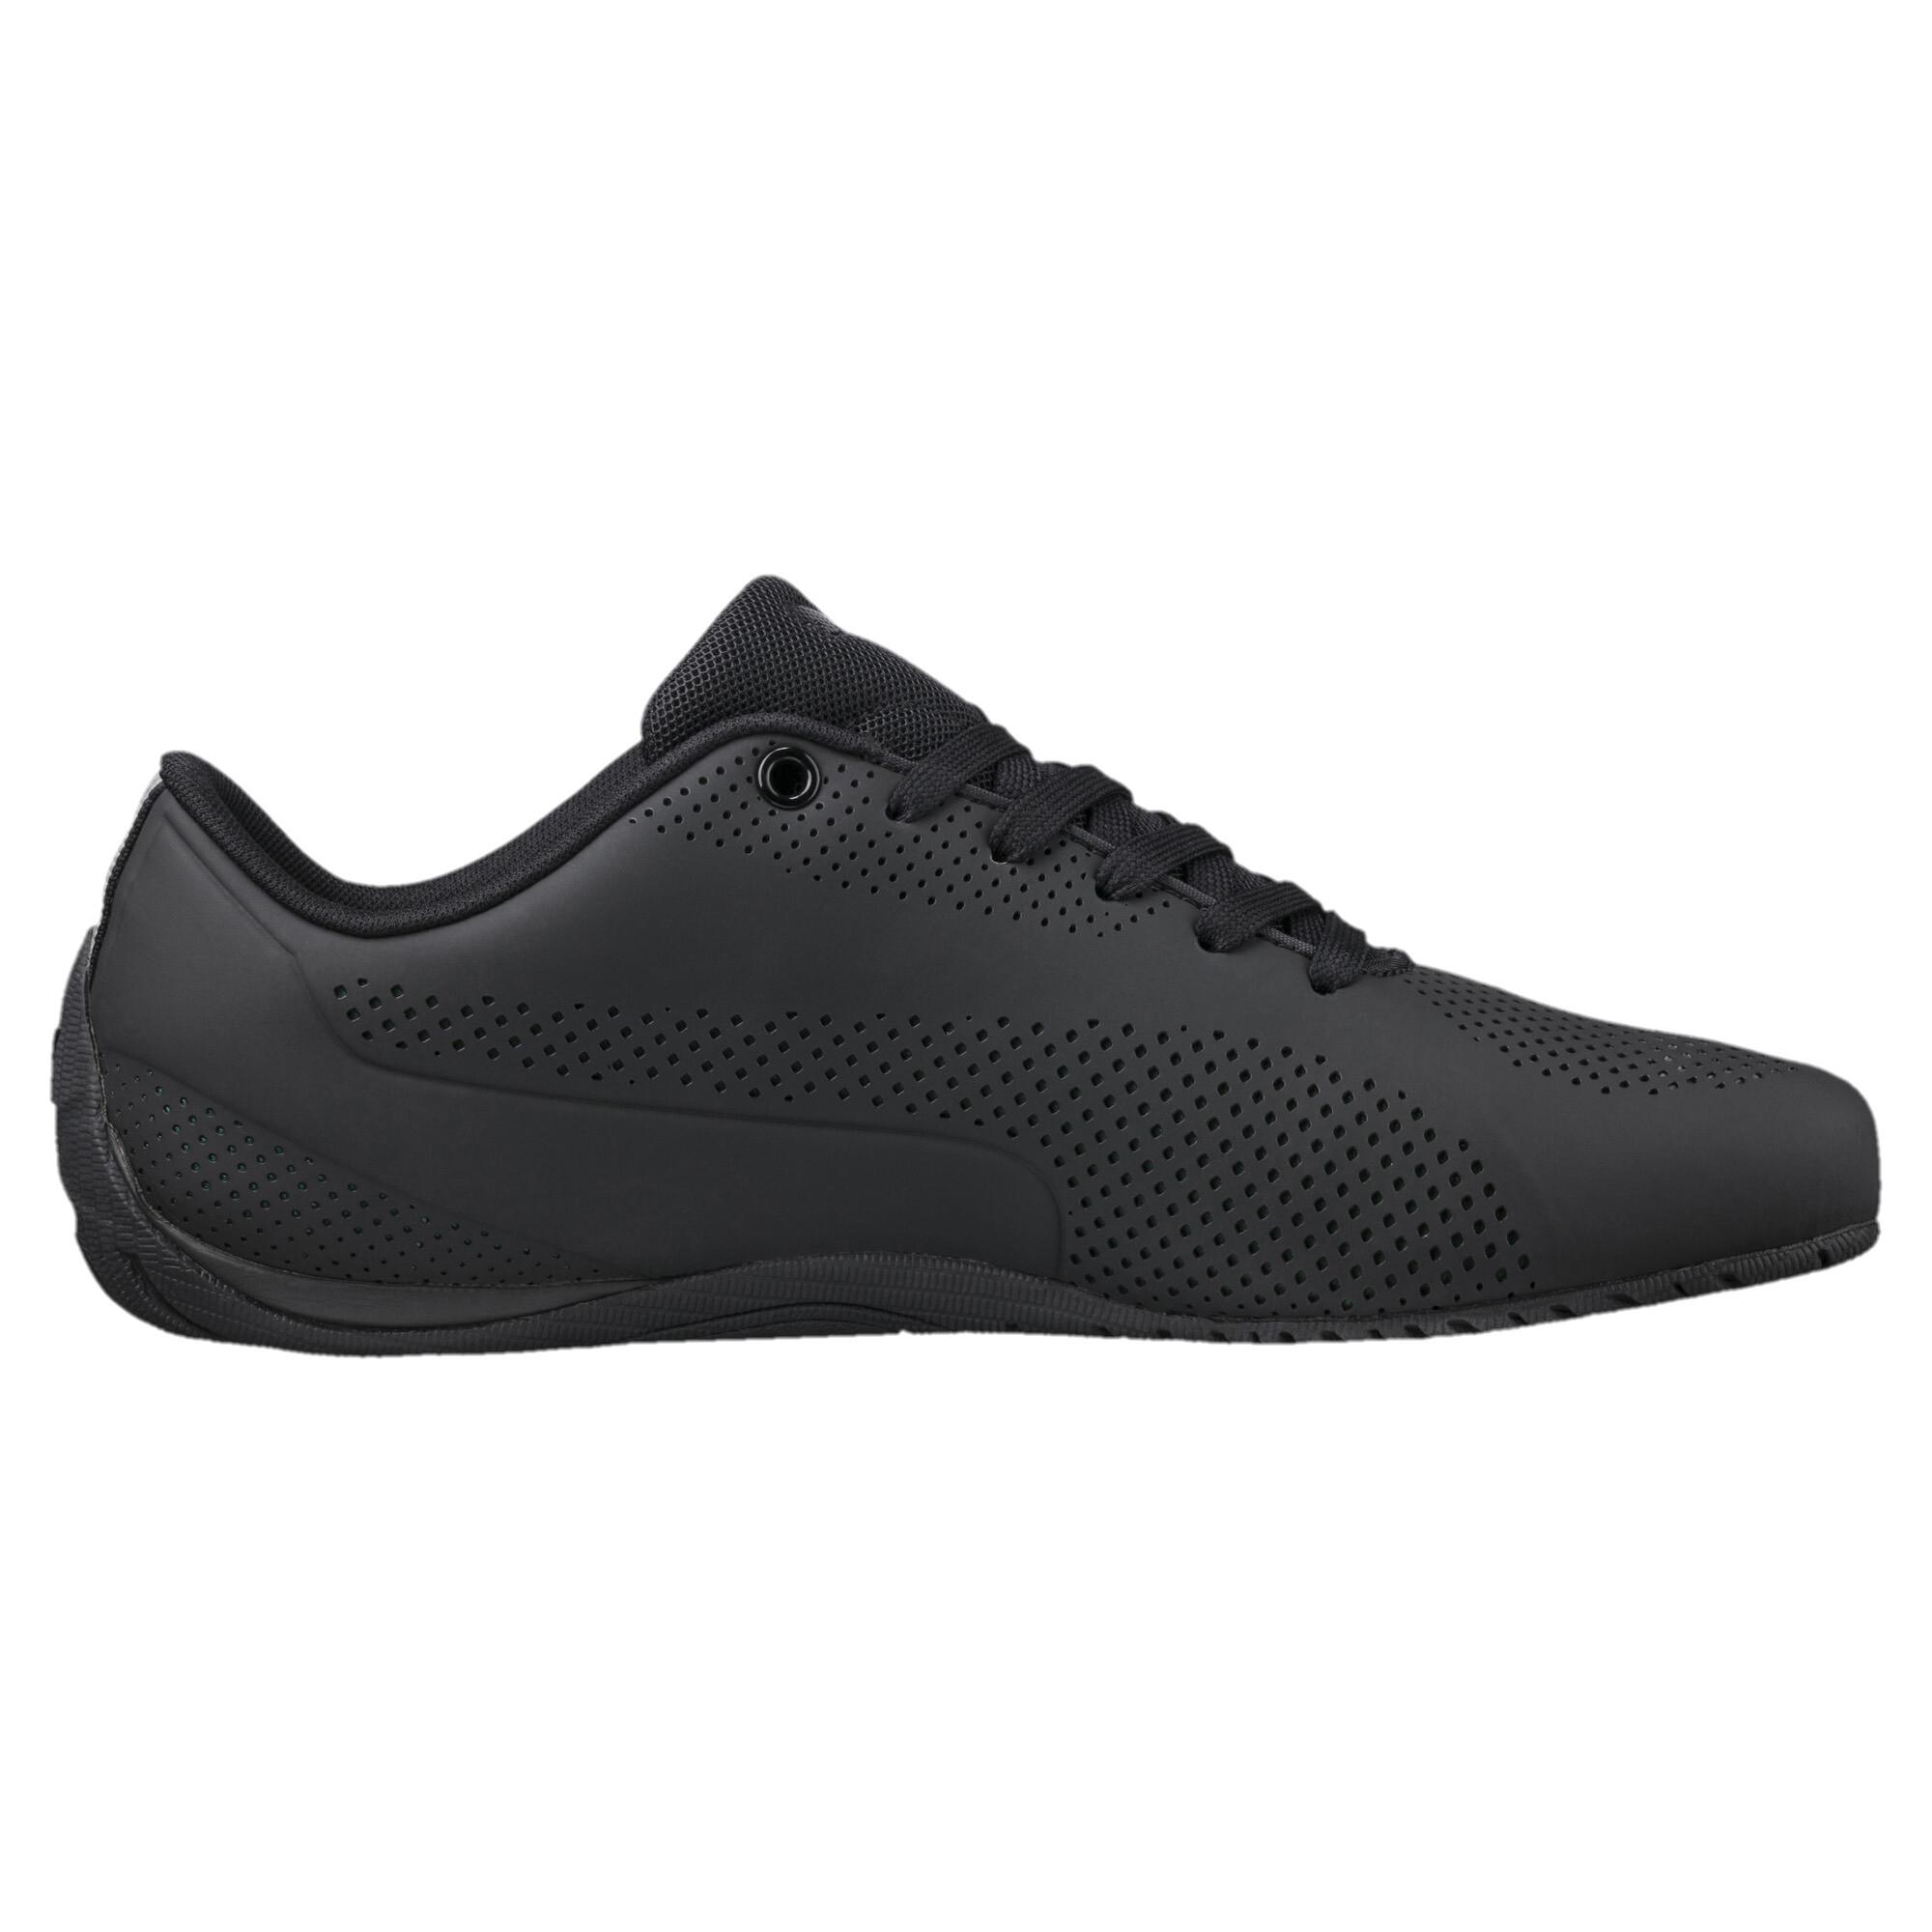 PUMA-Drift-Cat-Ultra-Reflective-Men-039-s-Shoes-Men-Shoe-Sport-Classics thumbnail 5